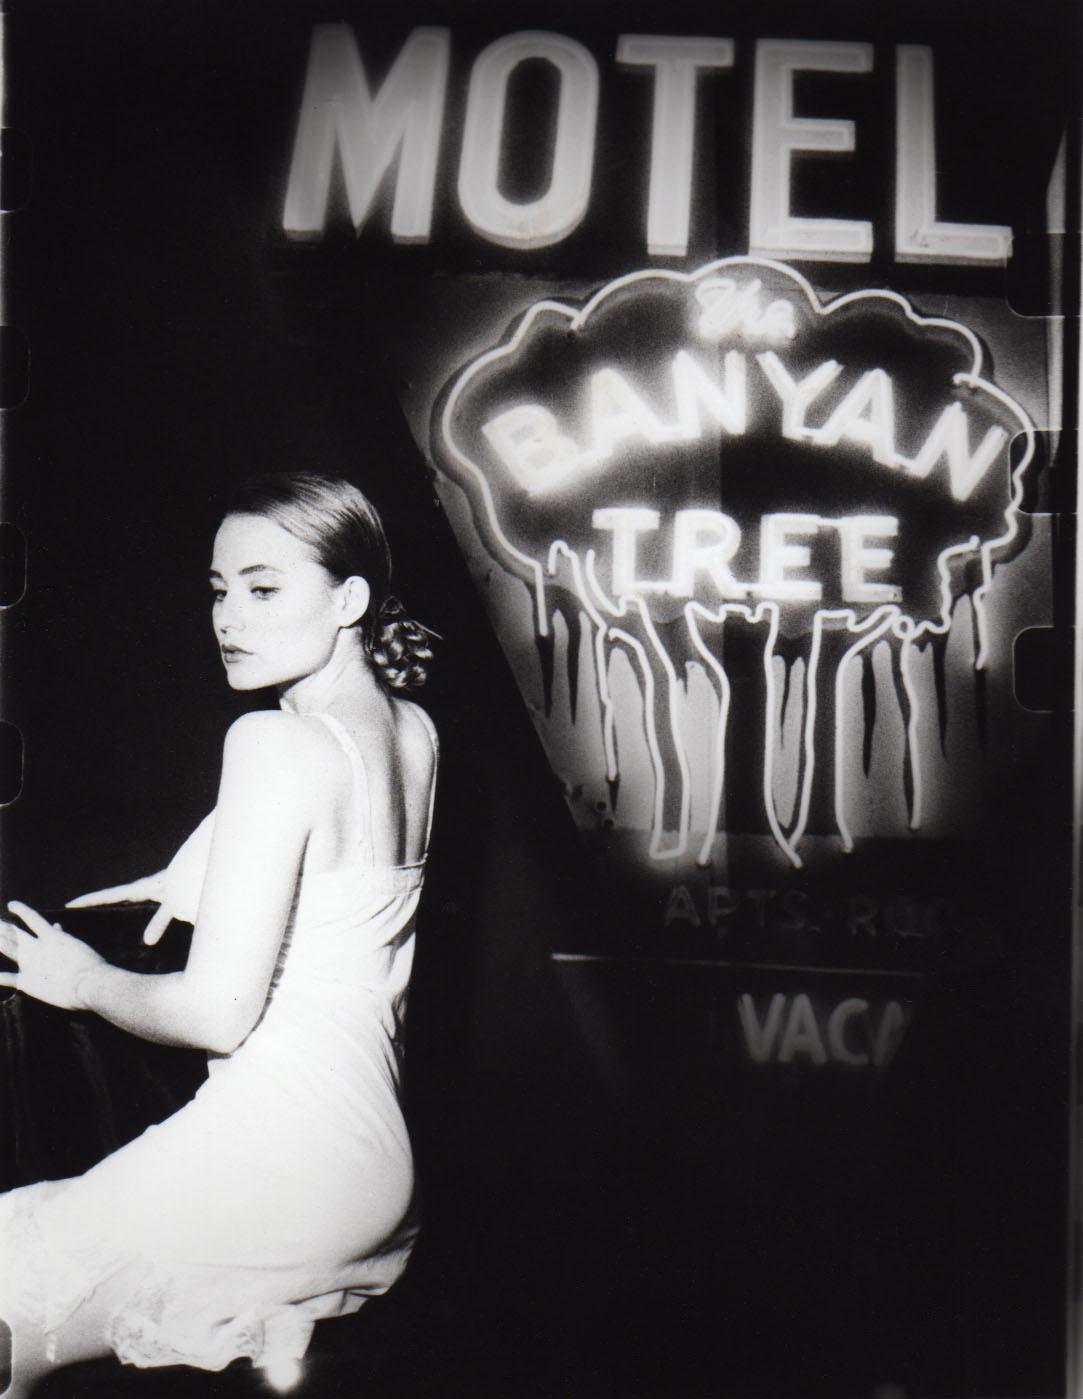 Banyan Tree Motel